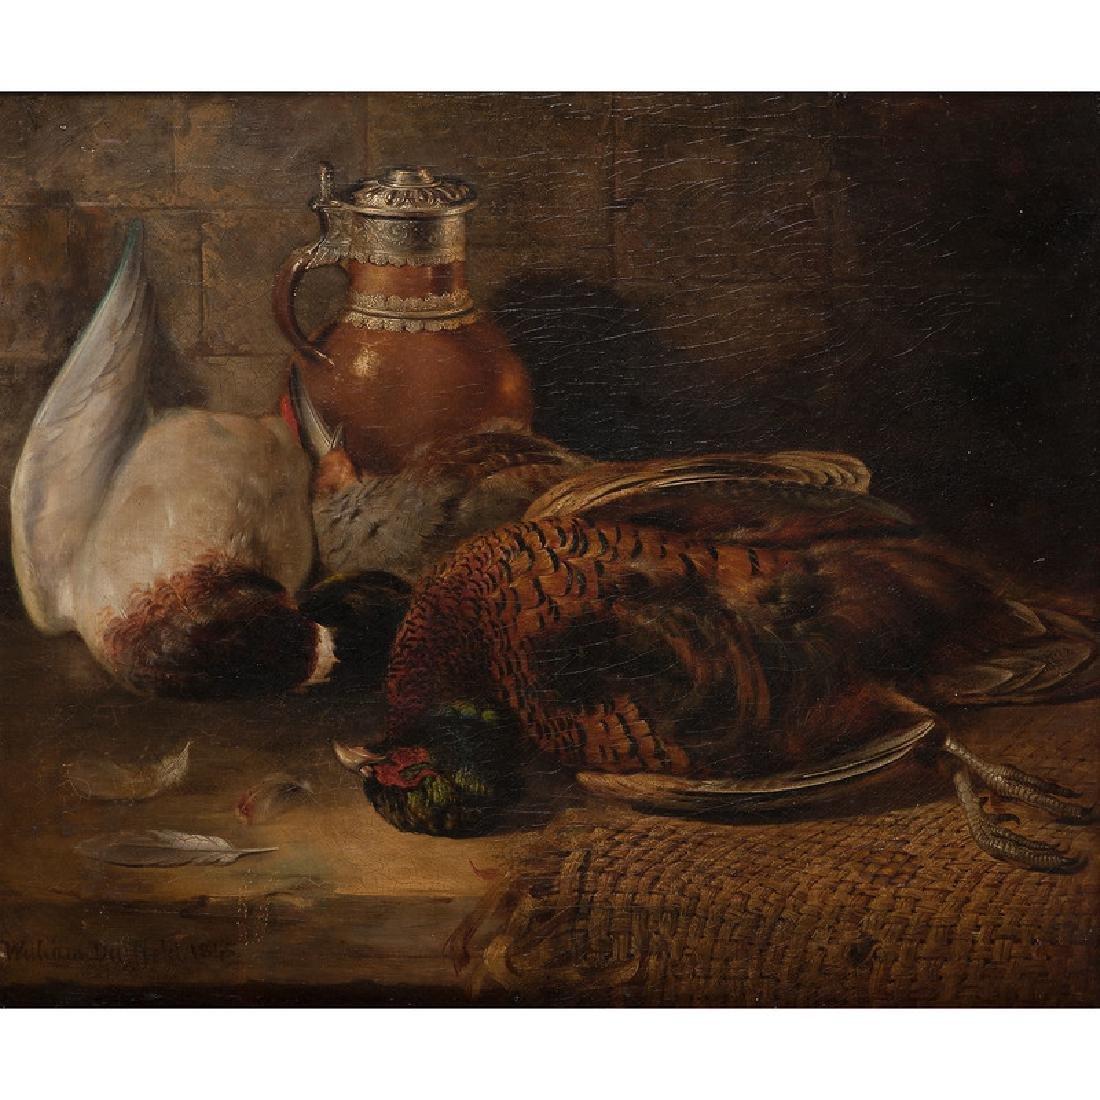 William Duffield (English, 1813-1863)